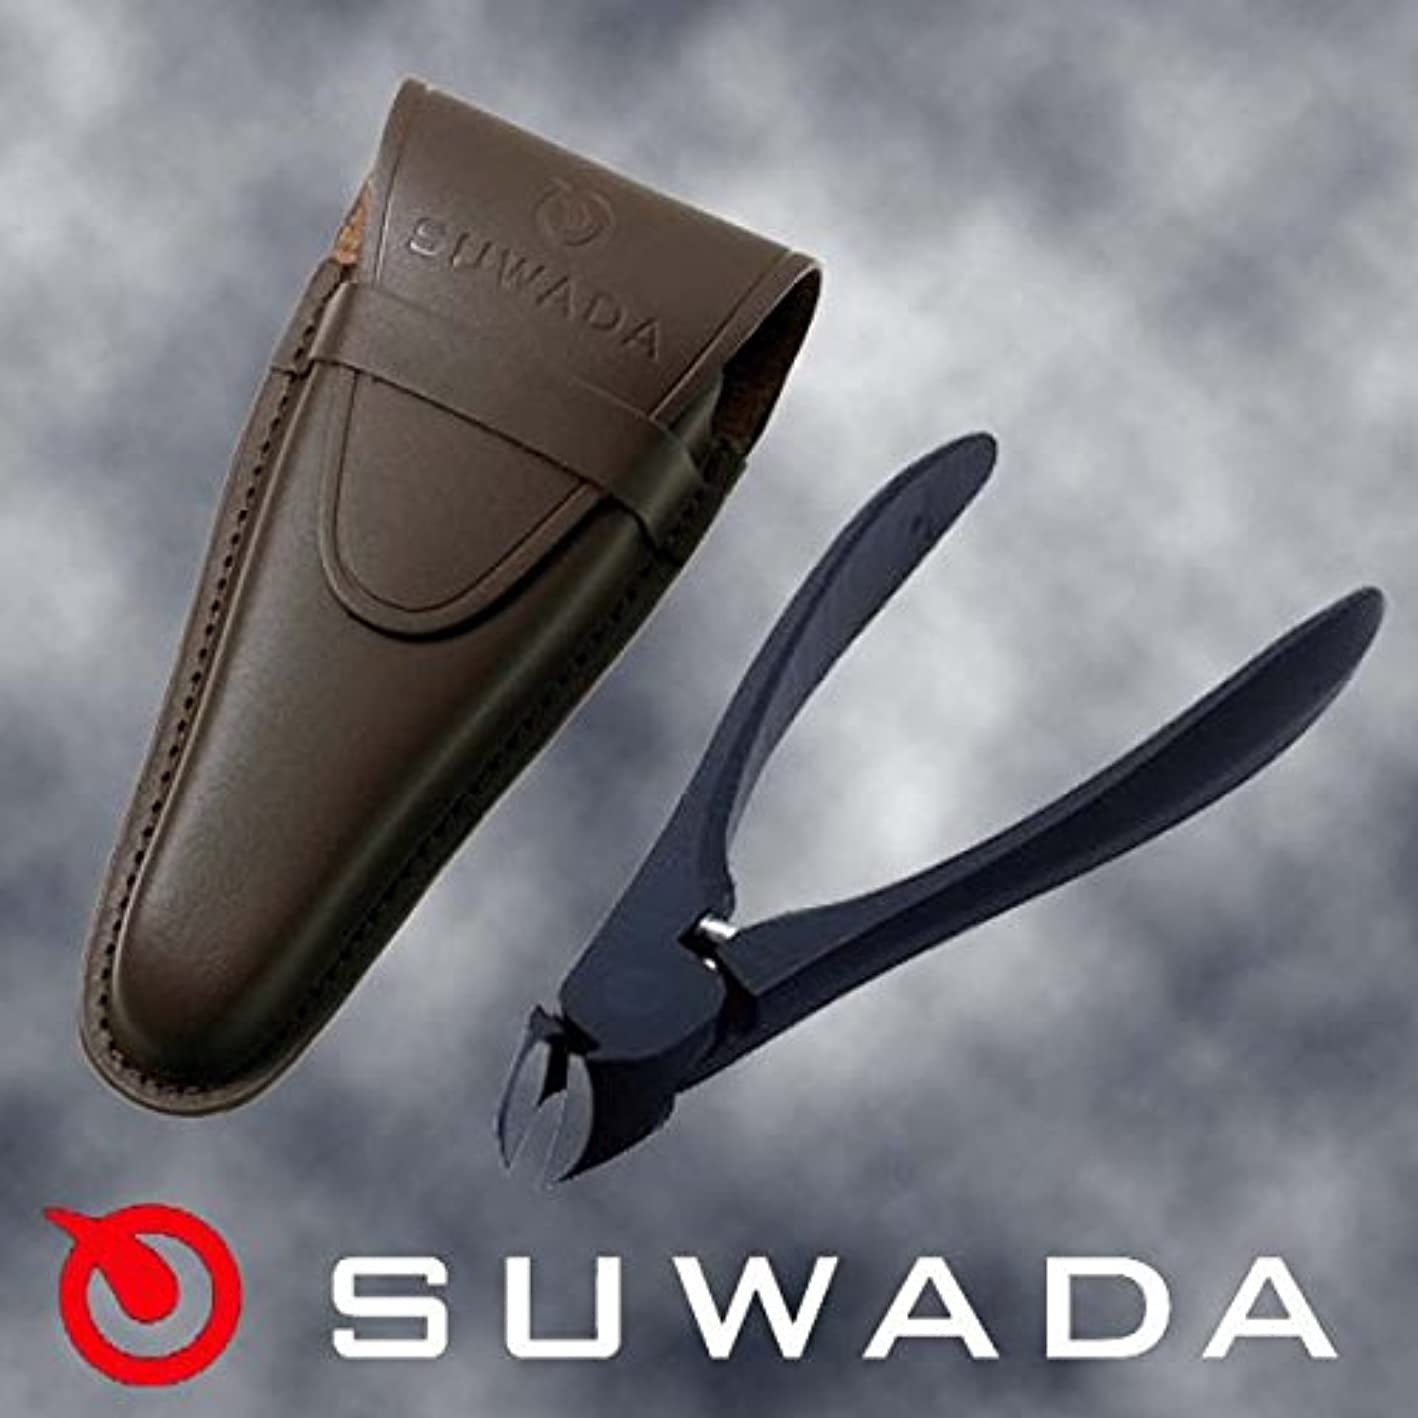 SUWADA爪切りブラックL&ブラウン革ケースセット 諏訪田製作所 スワダの爪切り